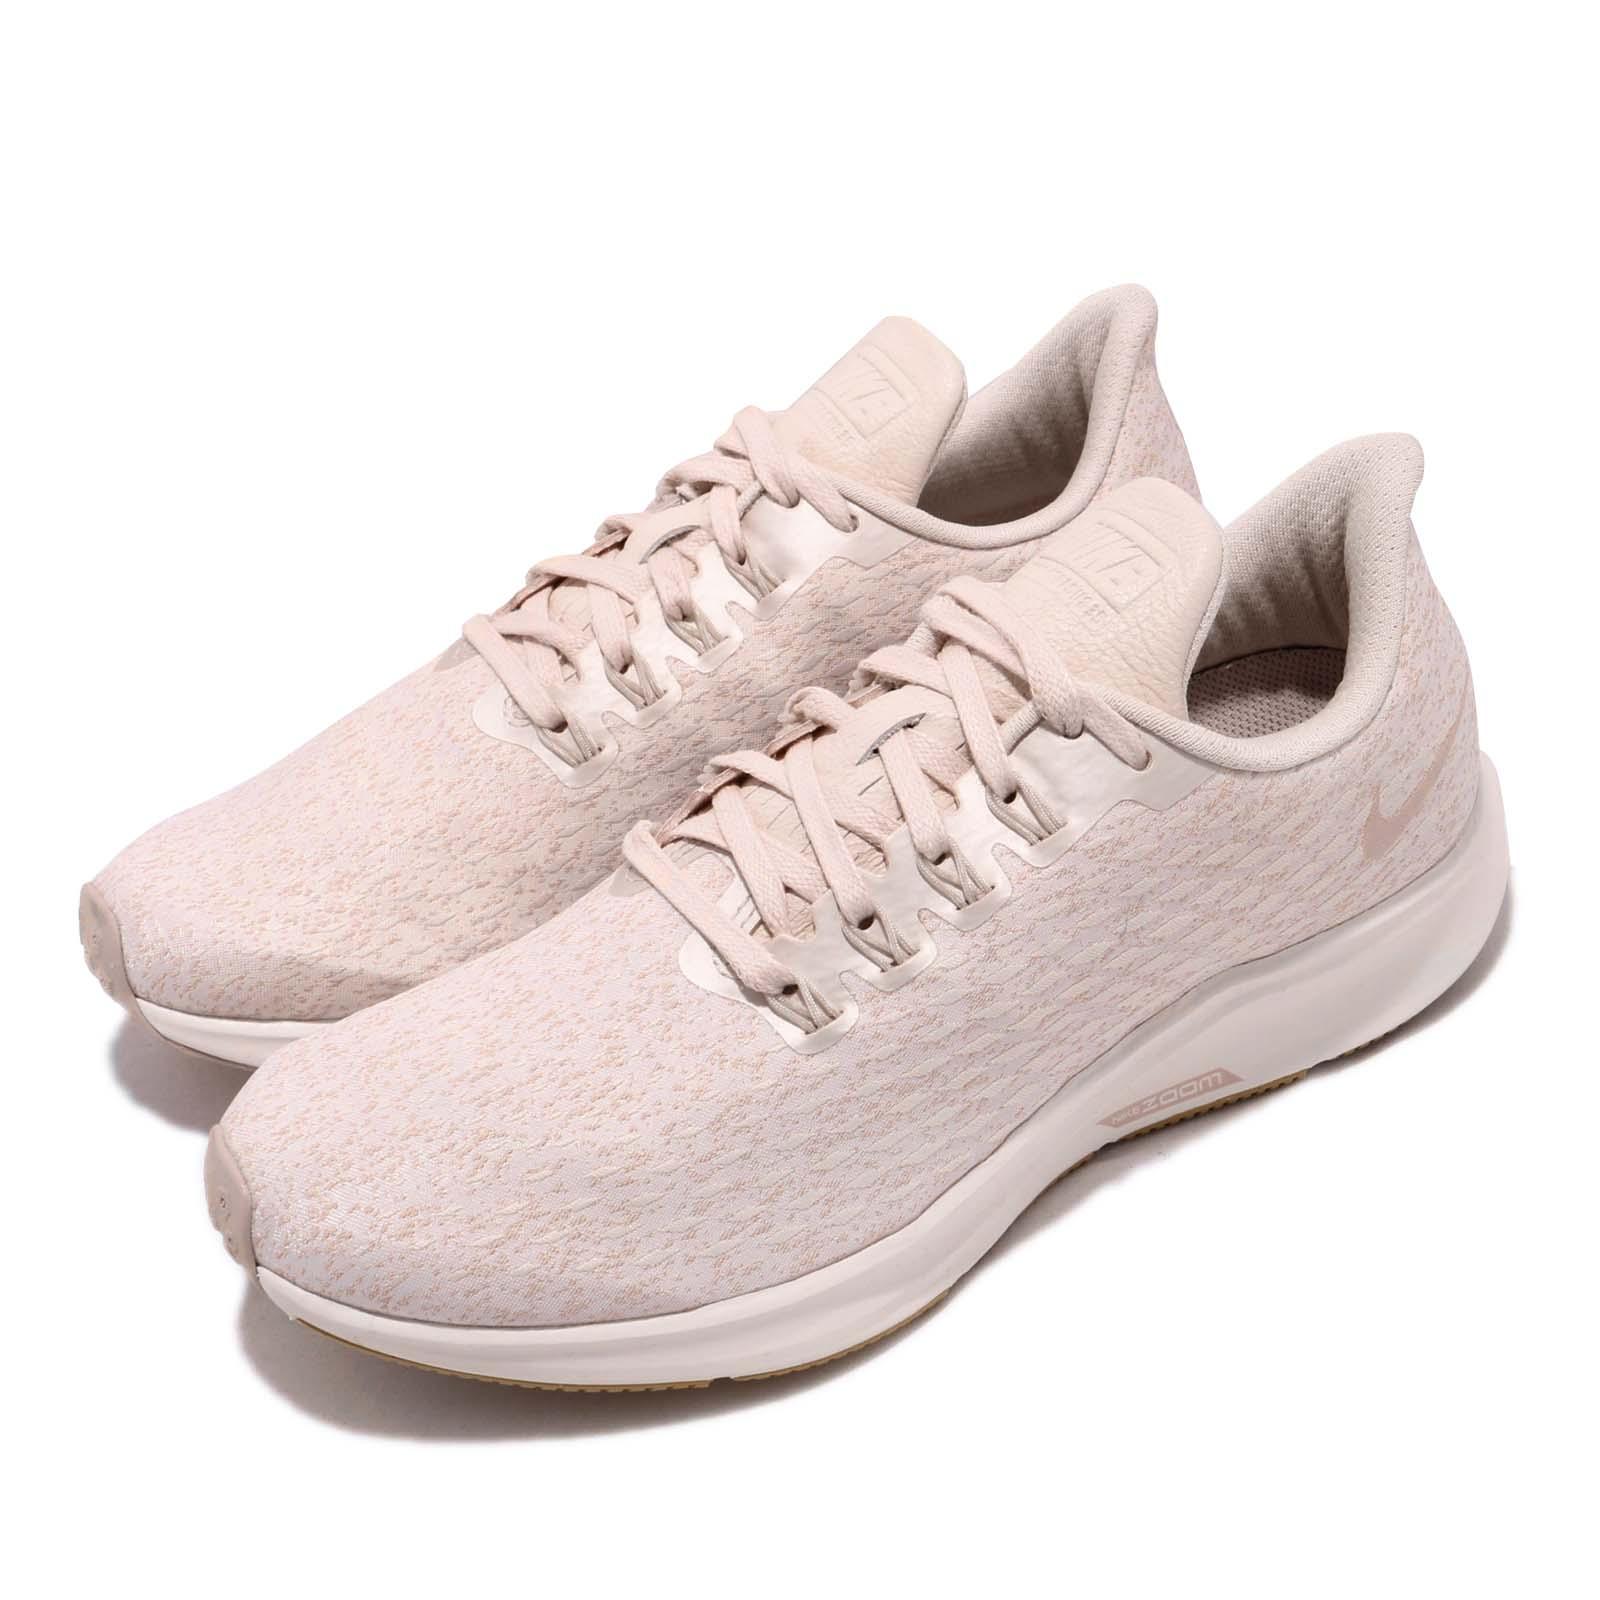 Nike 慢跑鞋 Zoom Pegasus 35 女鞋 AH8392-800